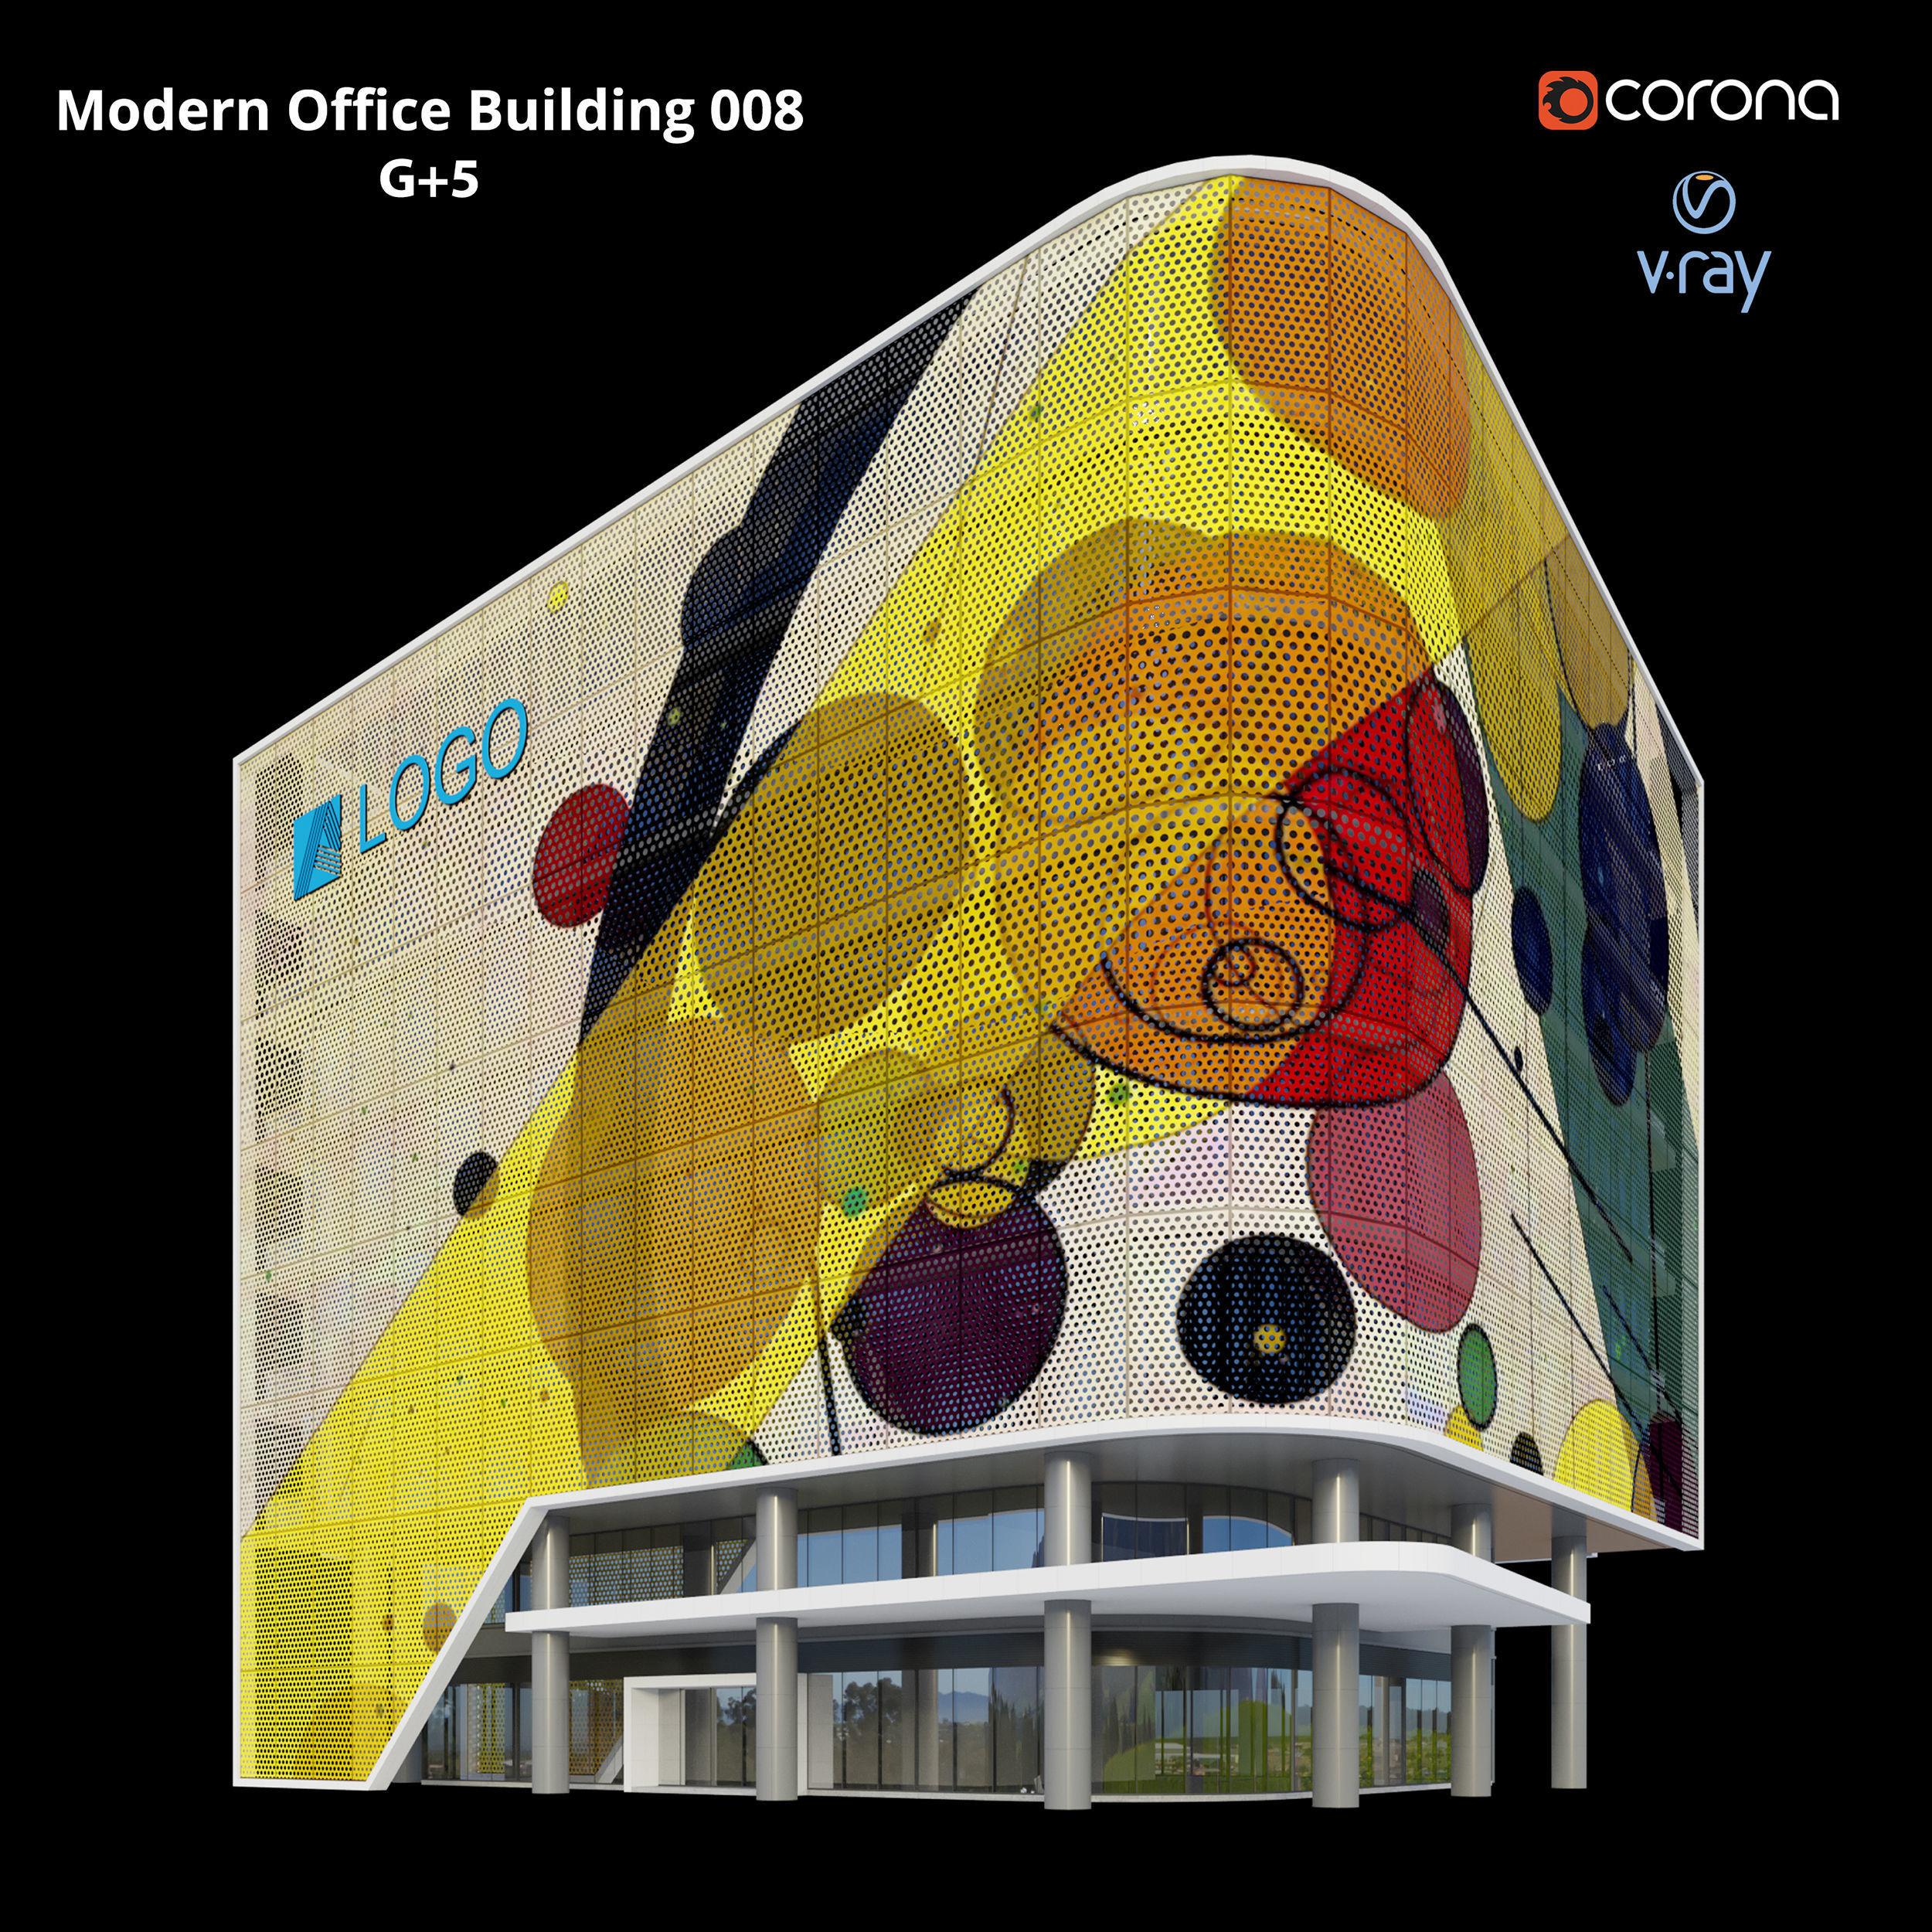 Modern Office Building 008